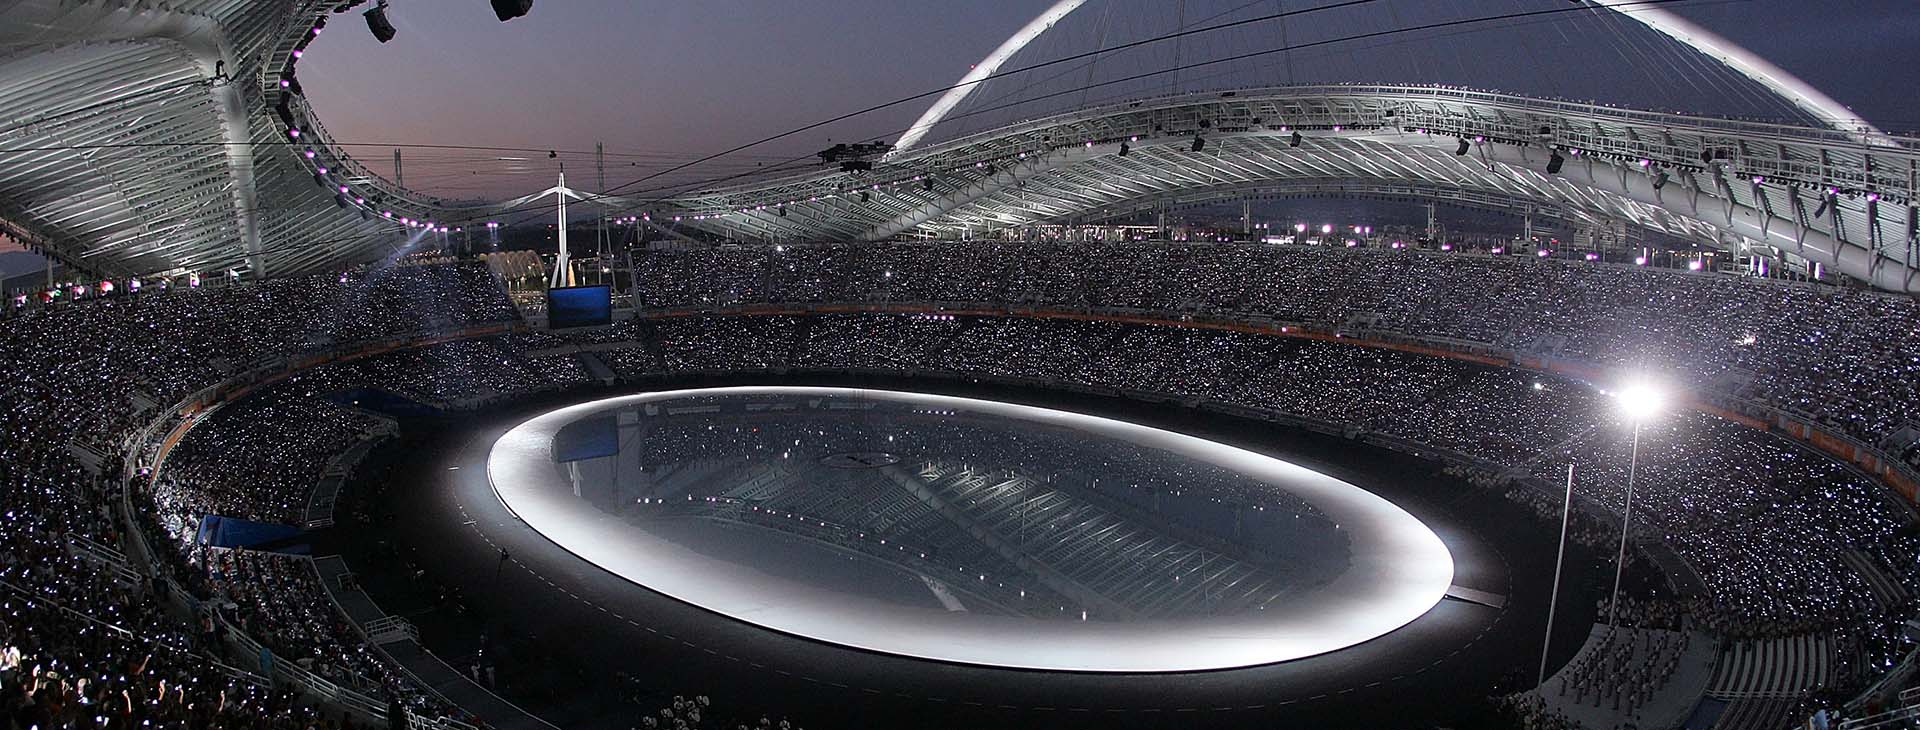 Olympic Stadium of Athens